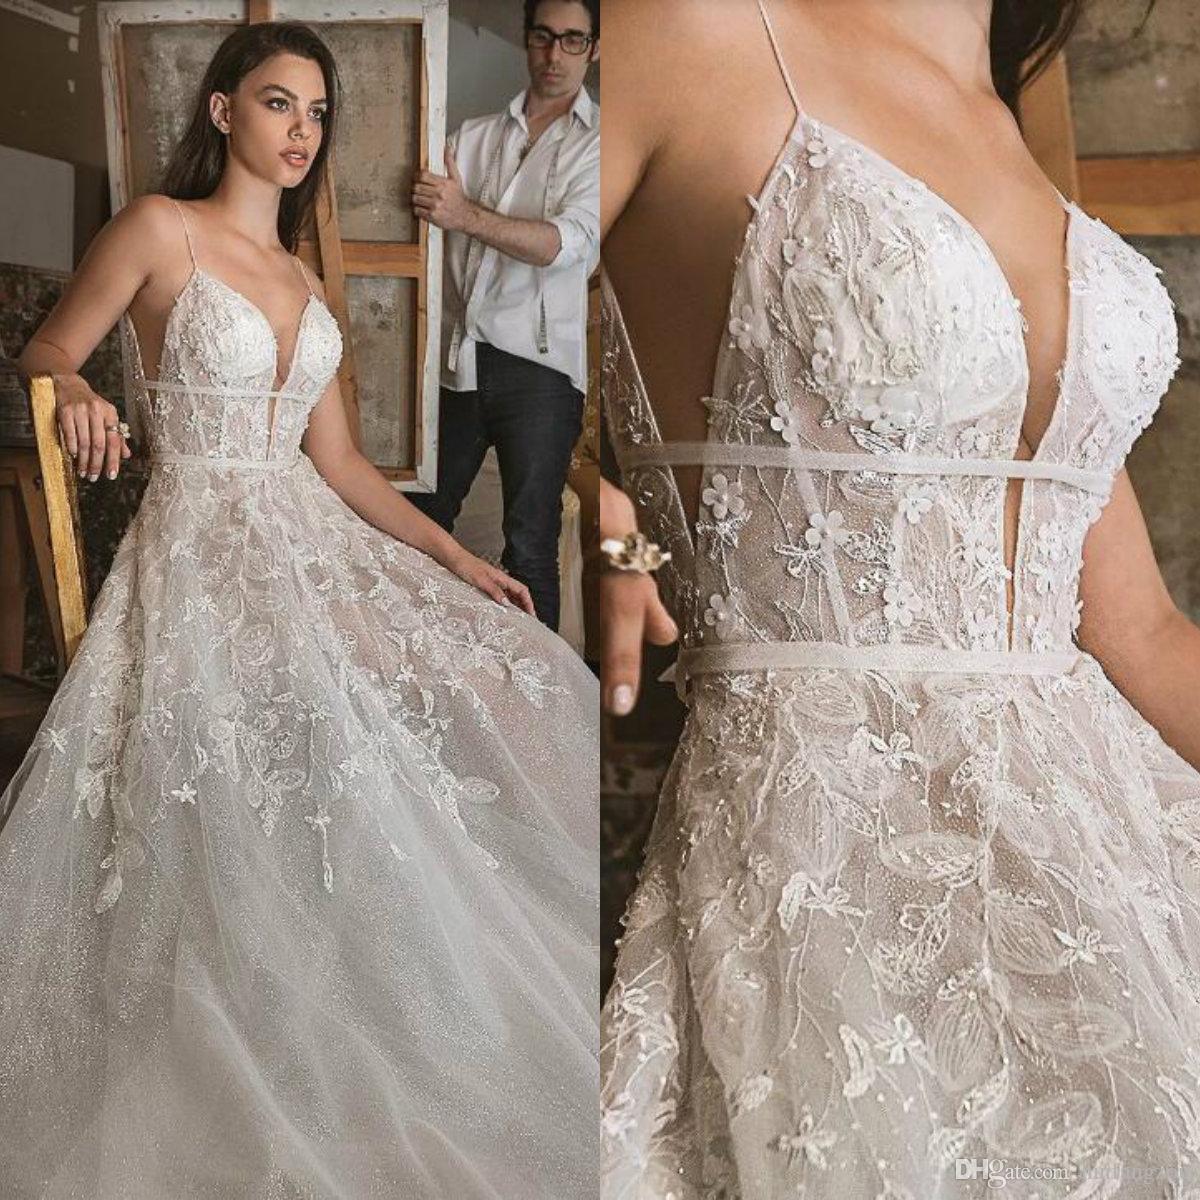 Discount 2019 Sexy Designer Wedding Dresses Spaghetti Straps Illusion Lace  Applique Bridal Gowns Exposed Boning Beach Wedding Dress Vestidos De Novia  ... 38dff0762945